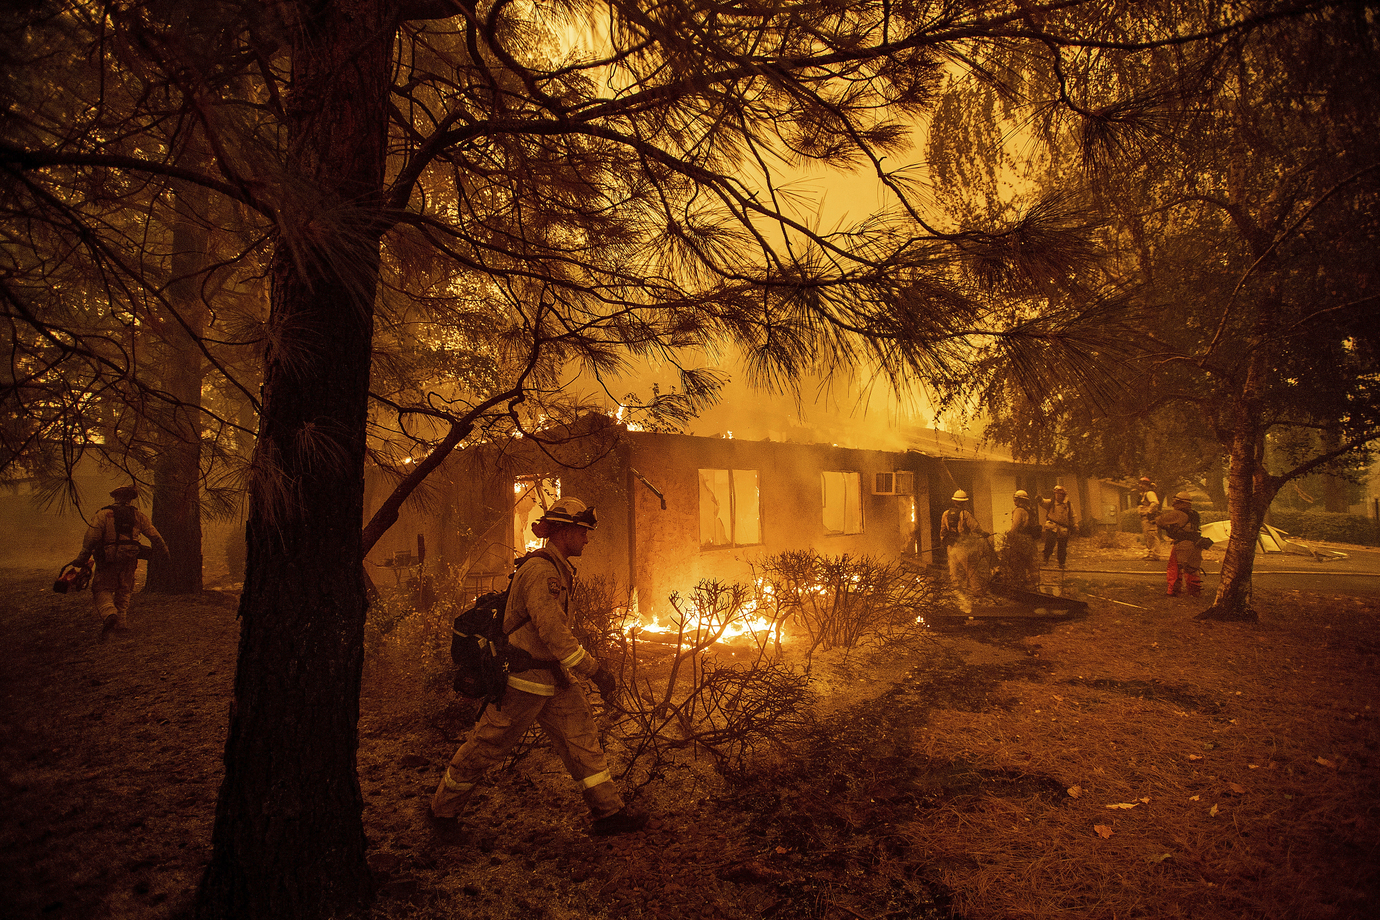 California_Wildfires_Insurance_82572-159532.jpg57486078